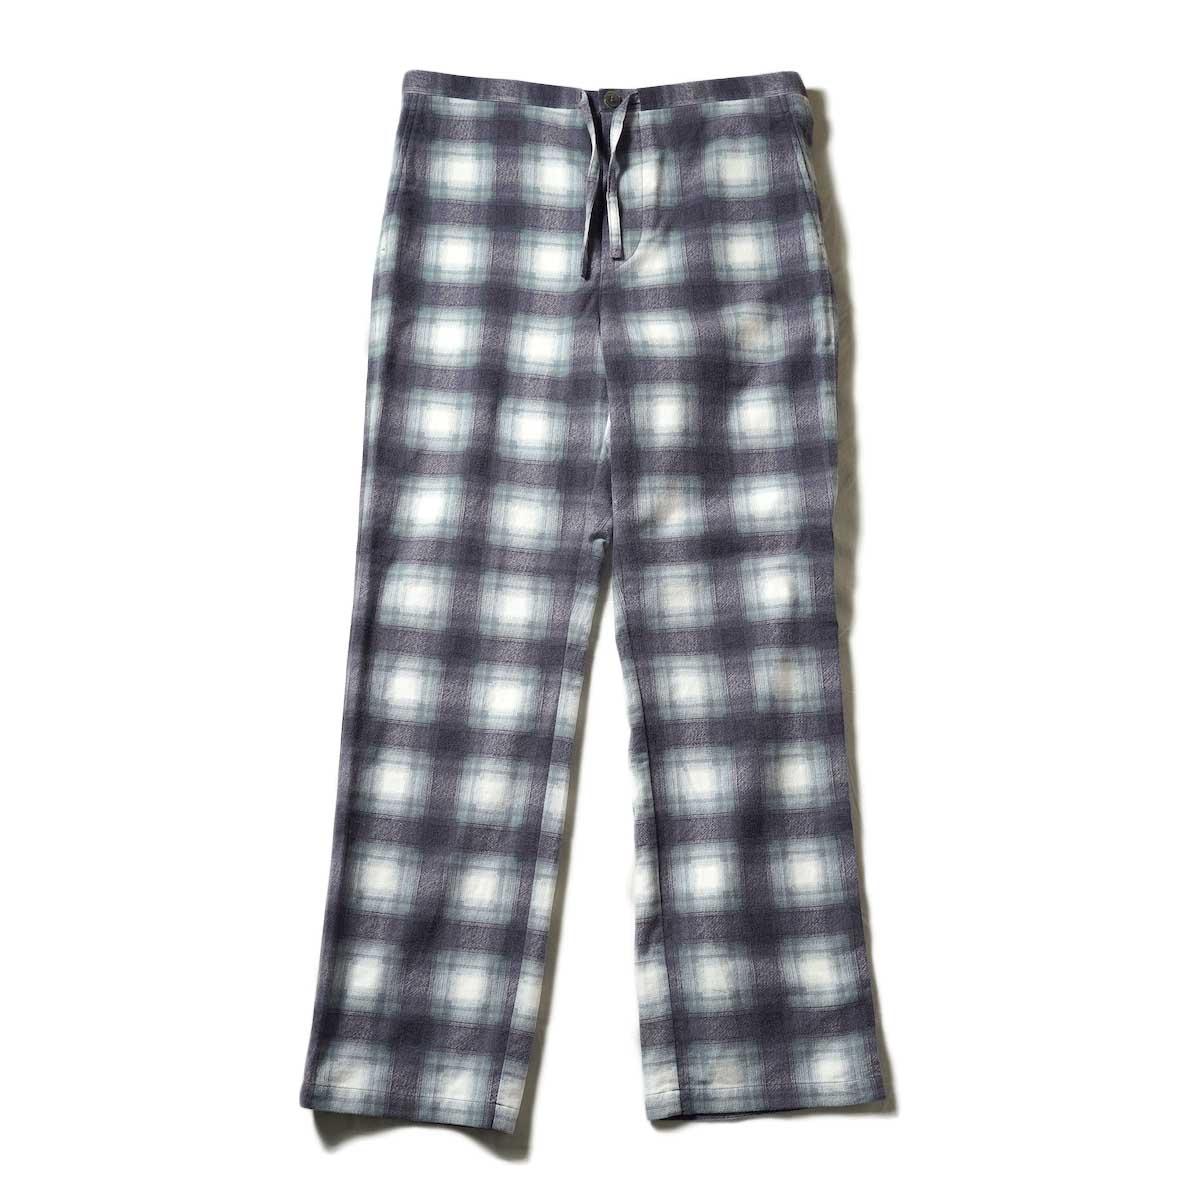 UNUSED / UW0993 Check Pants (Purple)